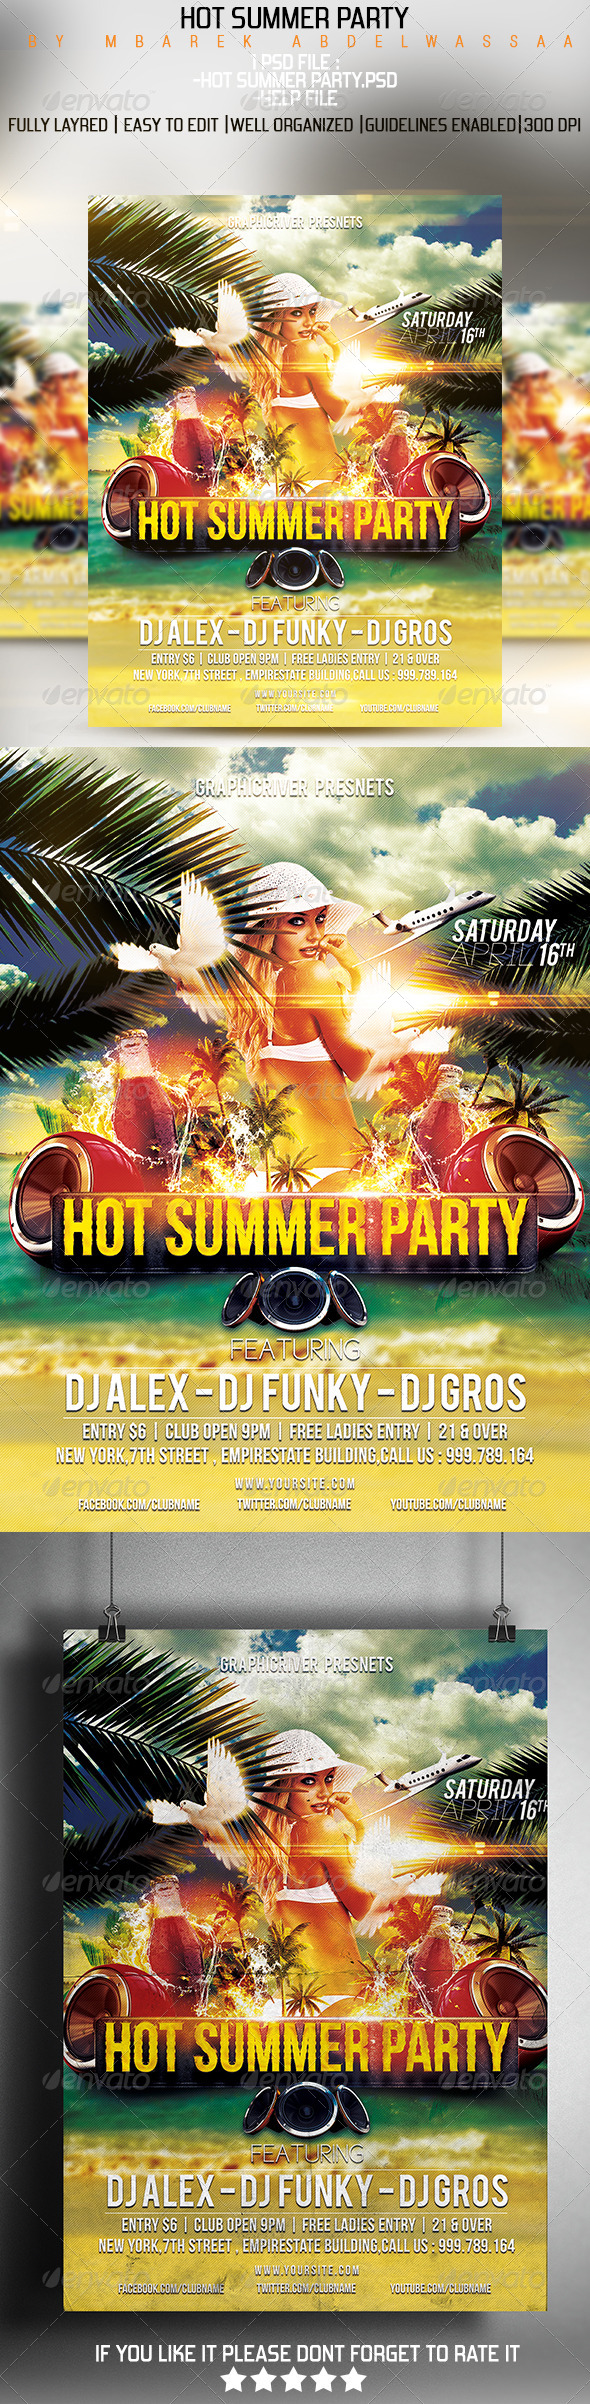 Hot Summer Party flyer - Flyers Print Templates